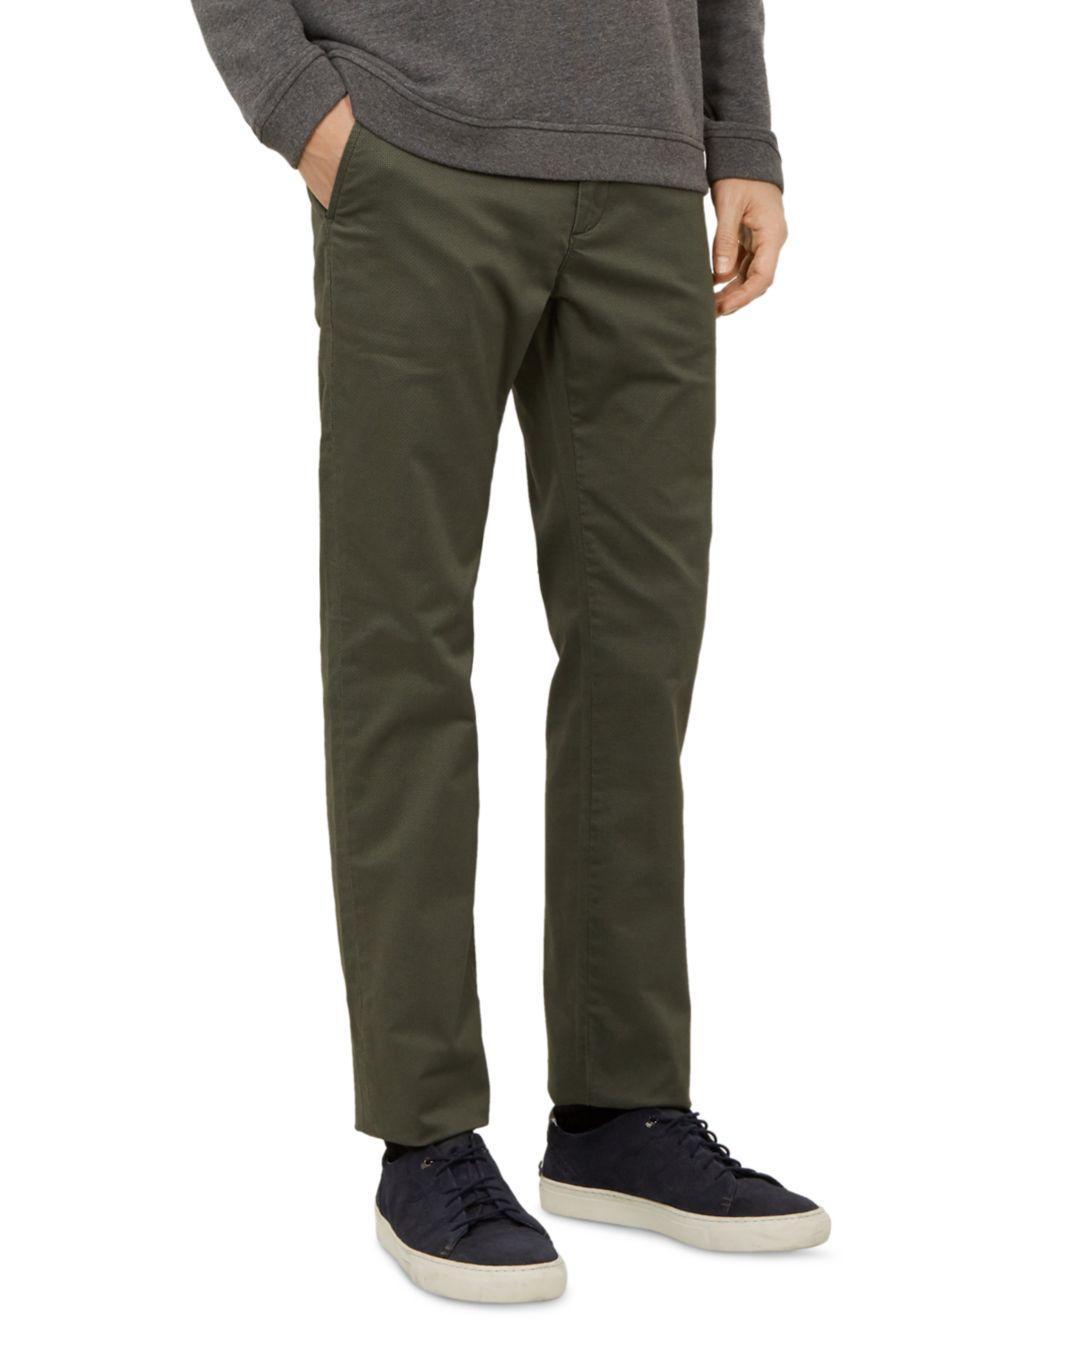 8463cd31f3e2 Lyst - Ted Baker Sladrid Slim Fit Printed Chinos in Green for Men